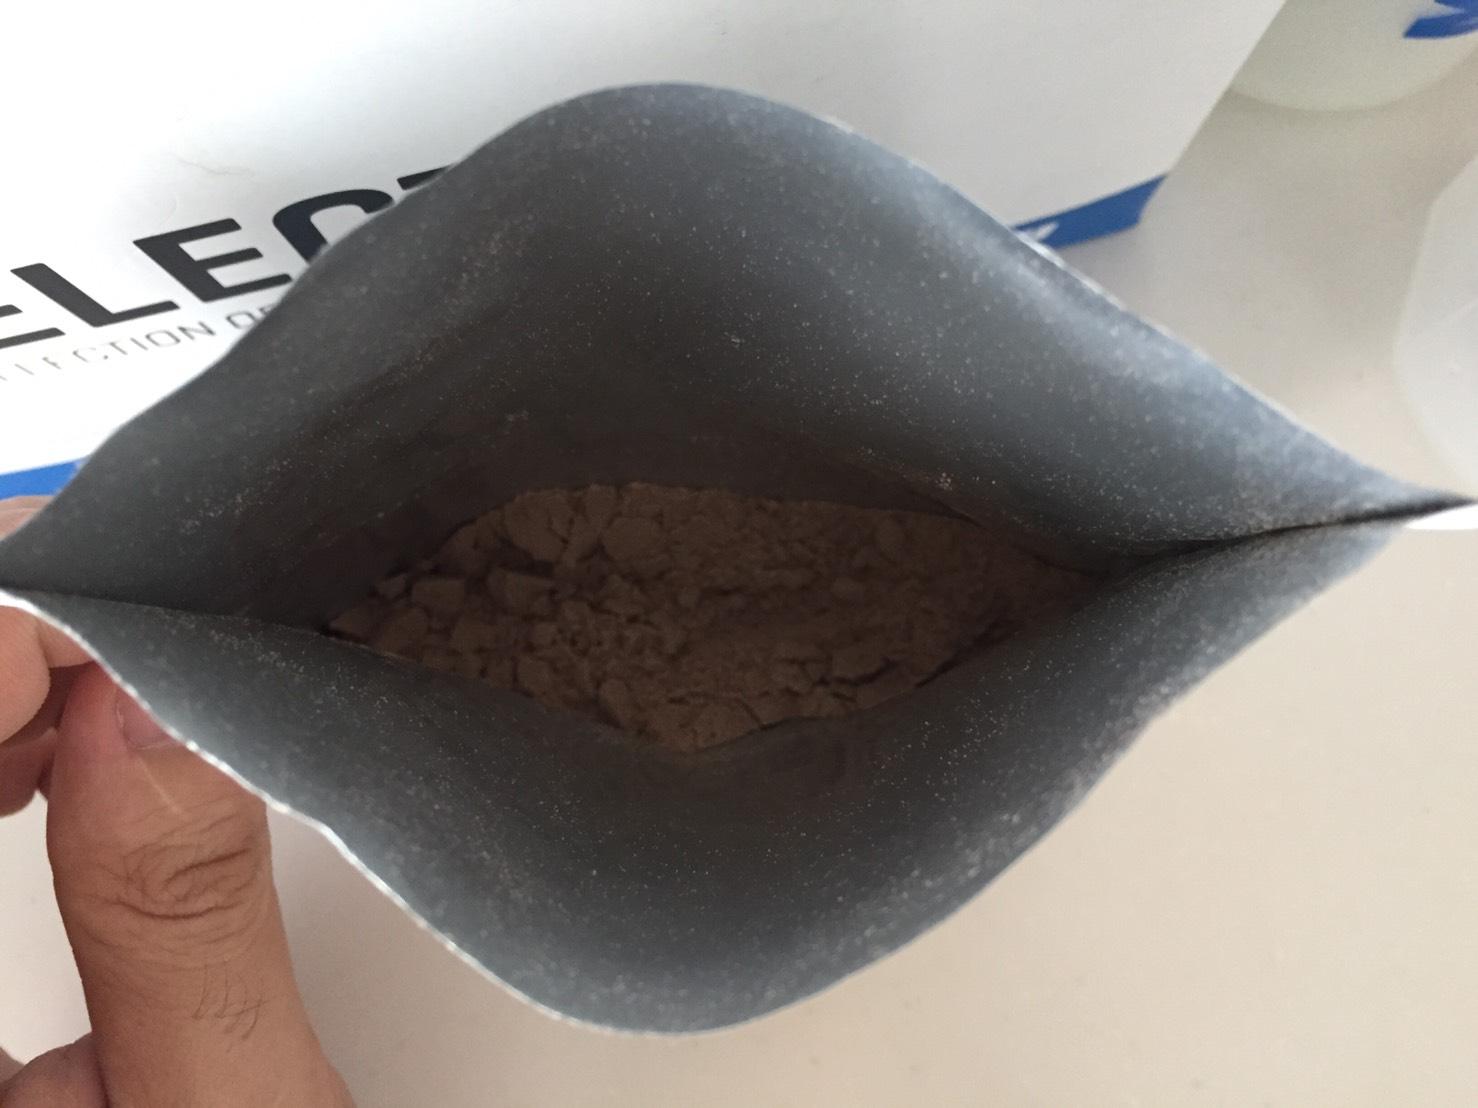 【WPC】Impactホエイプロテイン「Natural Chocolate(ナチュラルチョコレート味)」を開封した様子